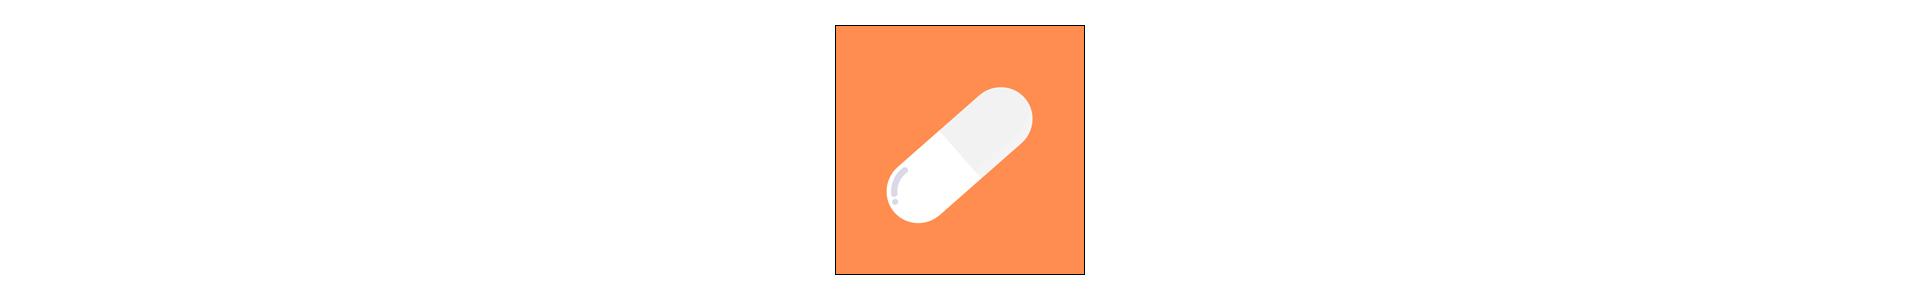 Vitamins/minerals